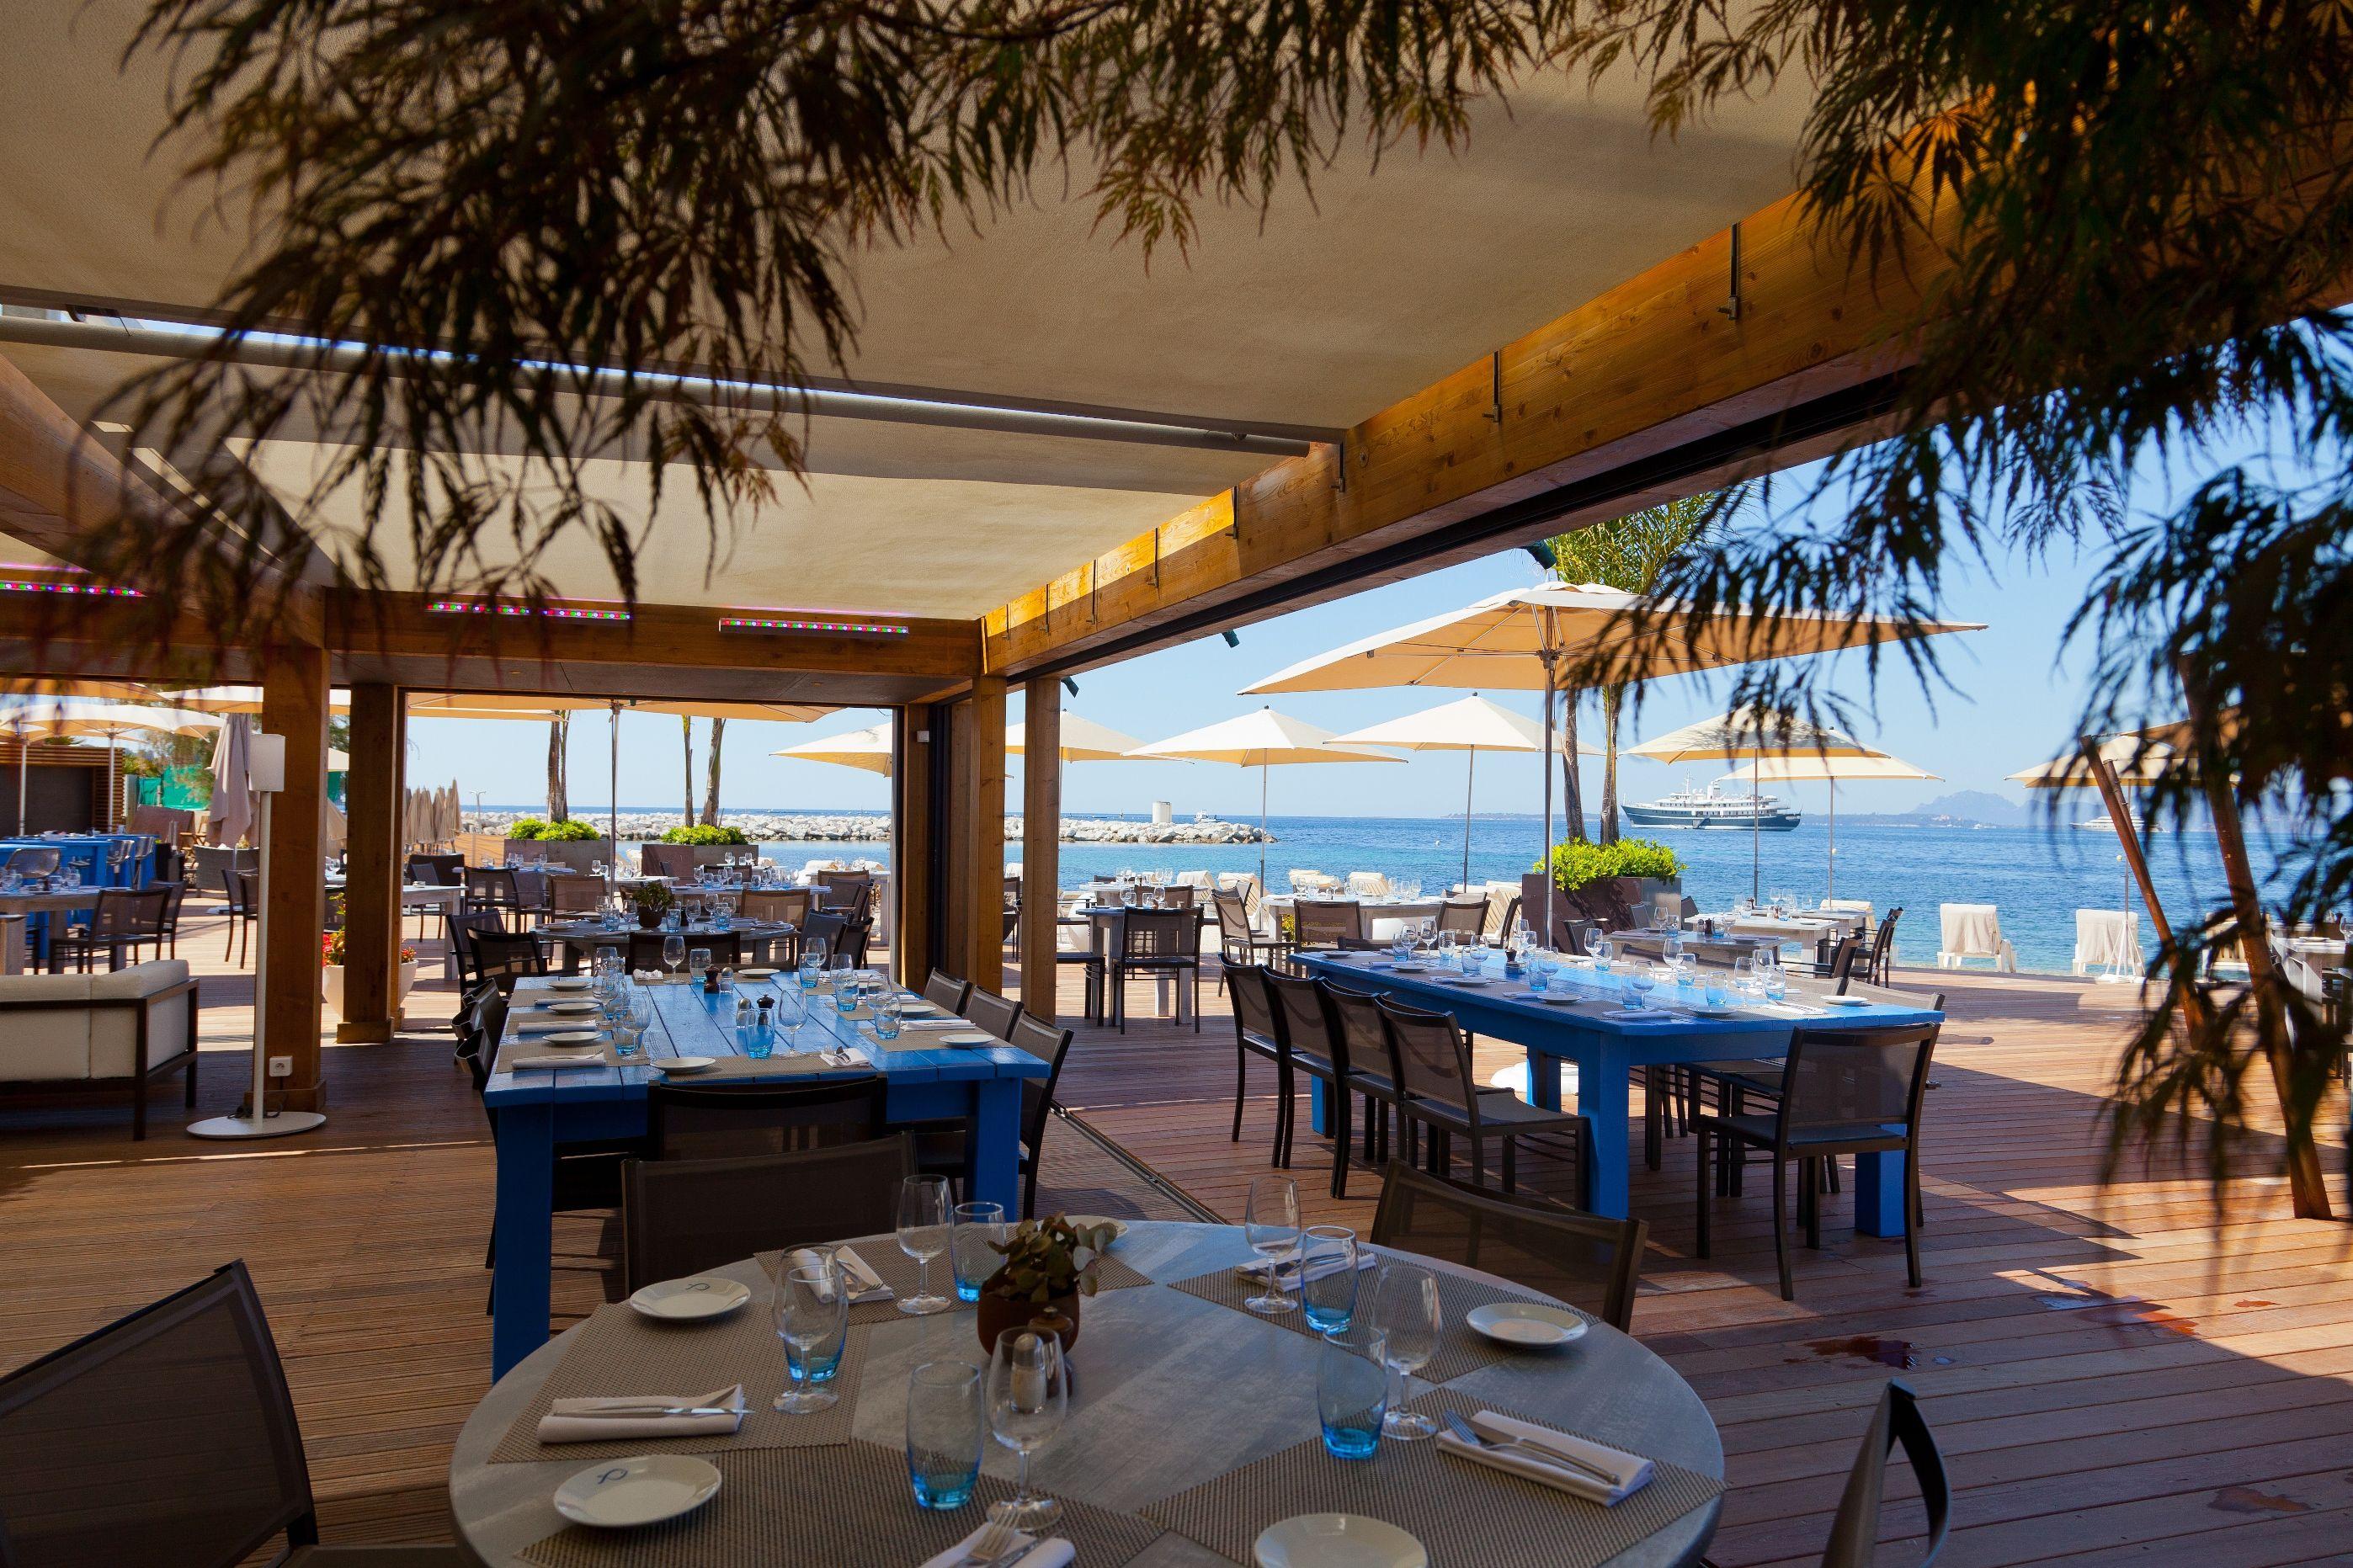 Beach Restaurant Le Cap